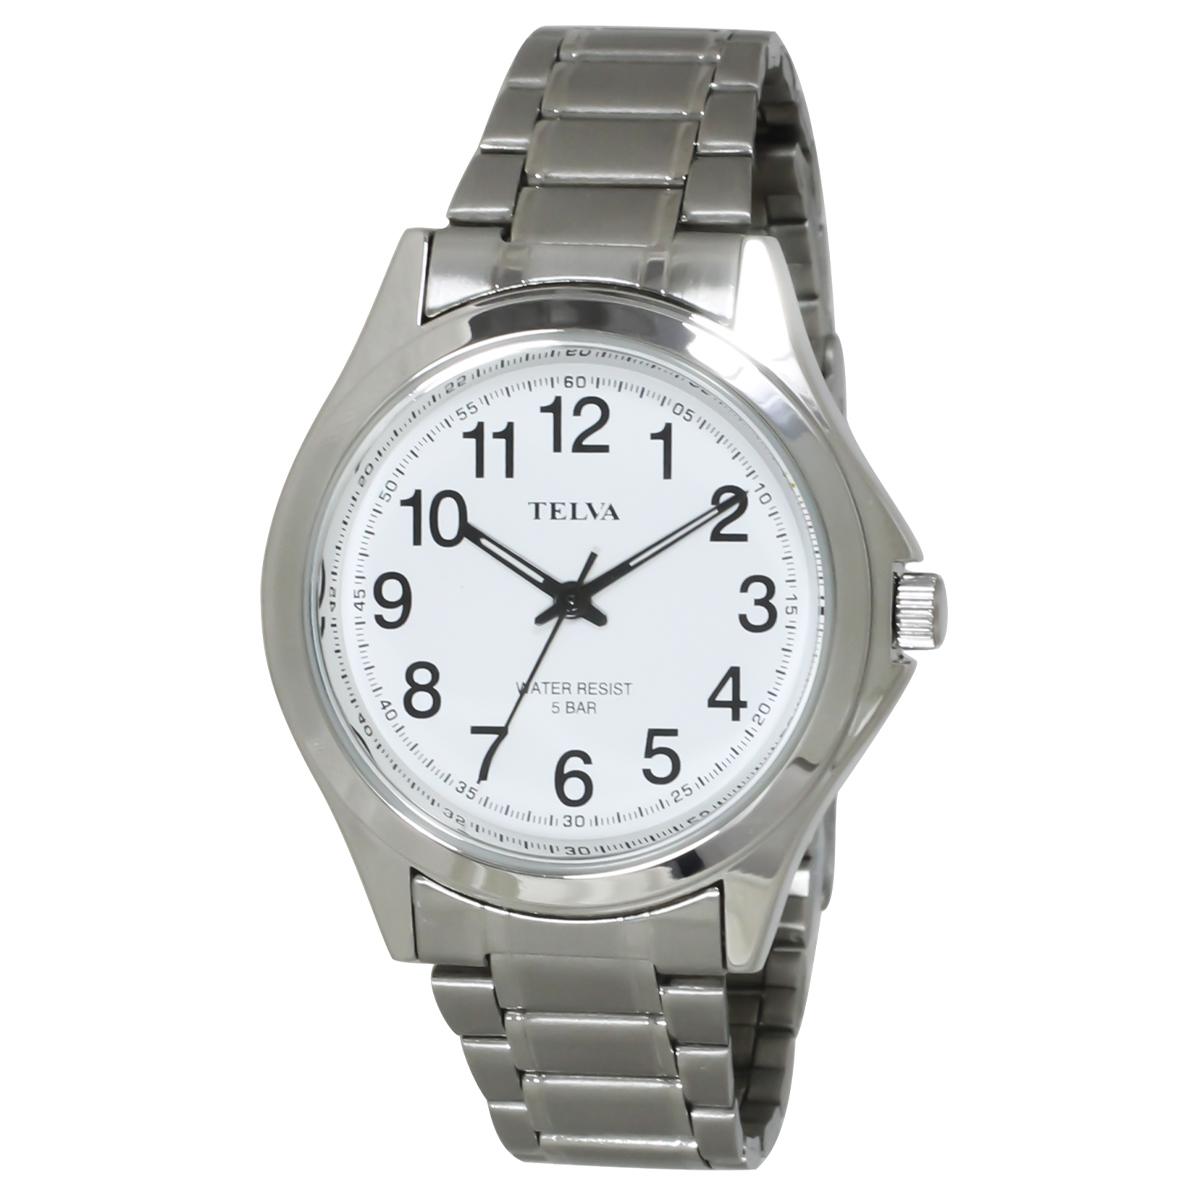 TELVA テルバ アナログウオッチ メンズ 10年電池 腕時計【TE-AM035】